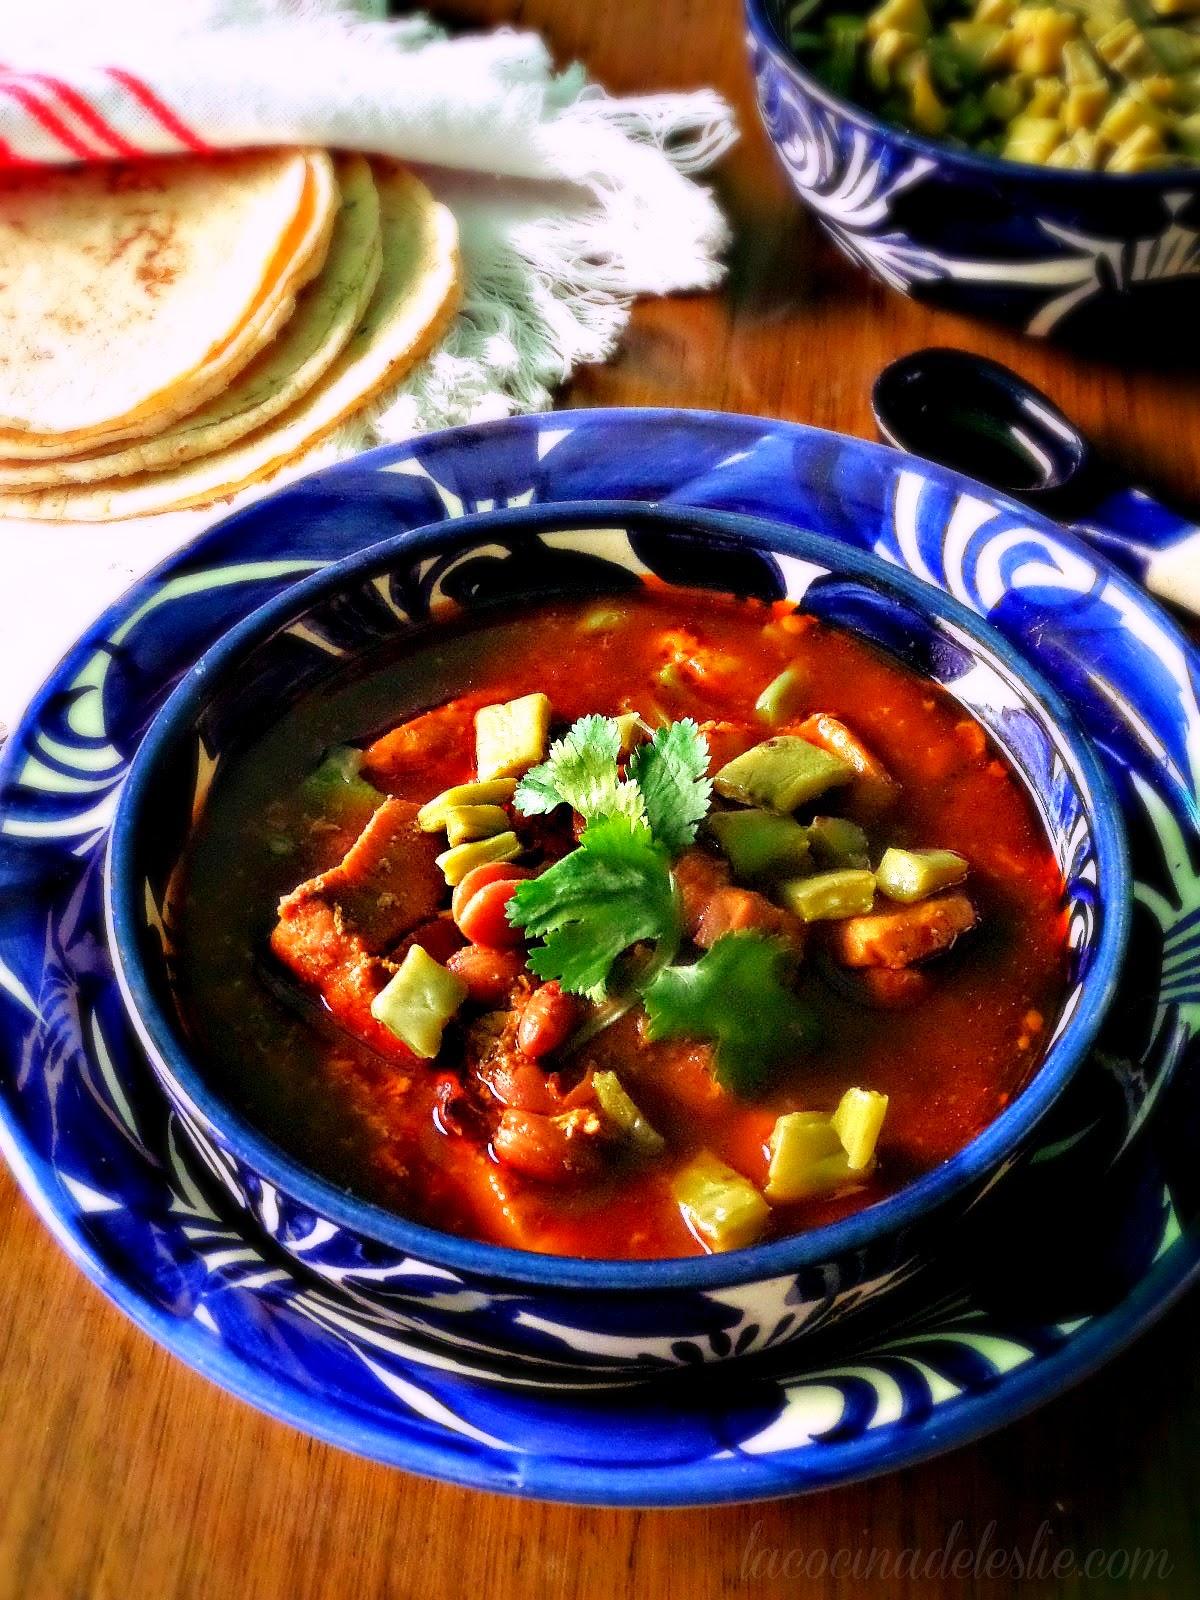 Pork Chile Colorado Stew - lacocinadeleslie.com